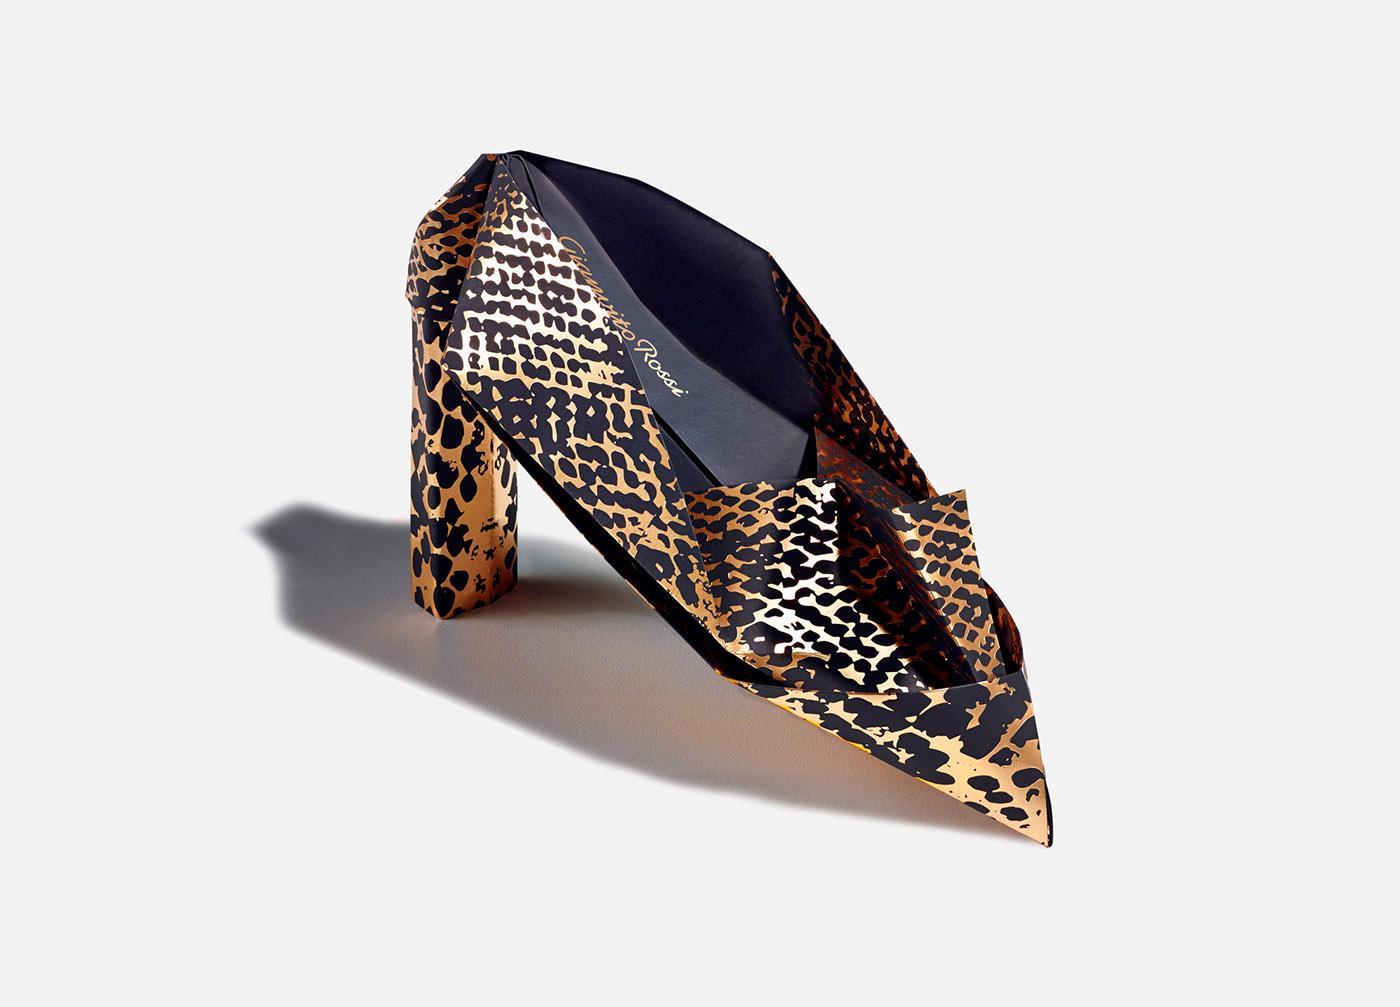 Origami Snake Shoe